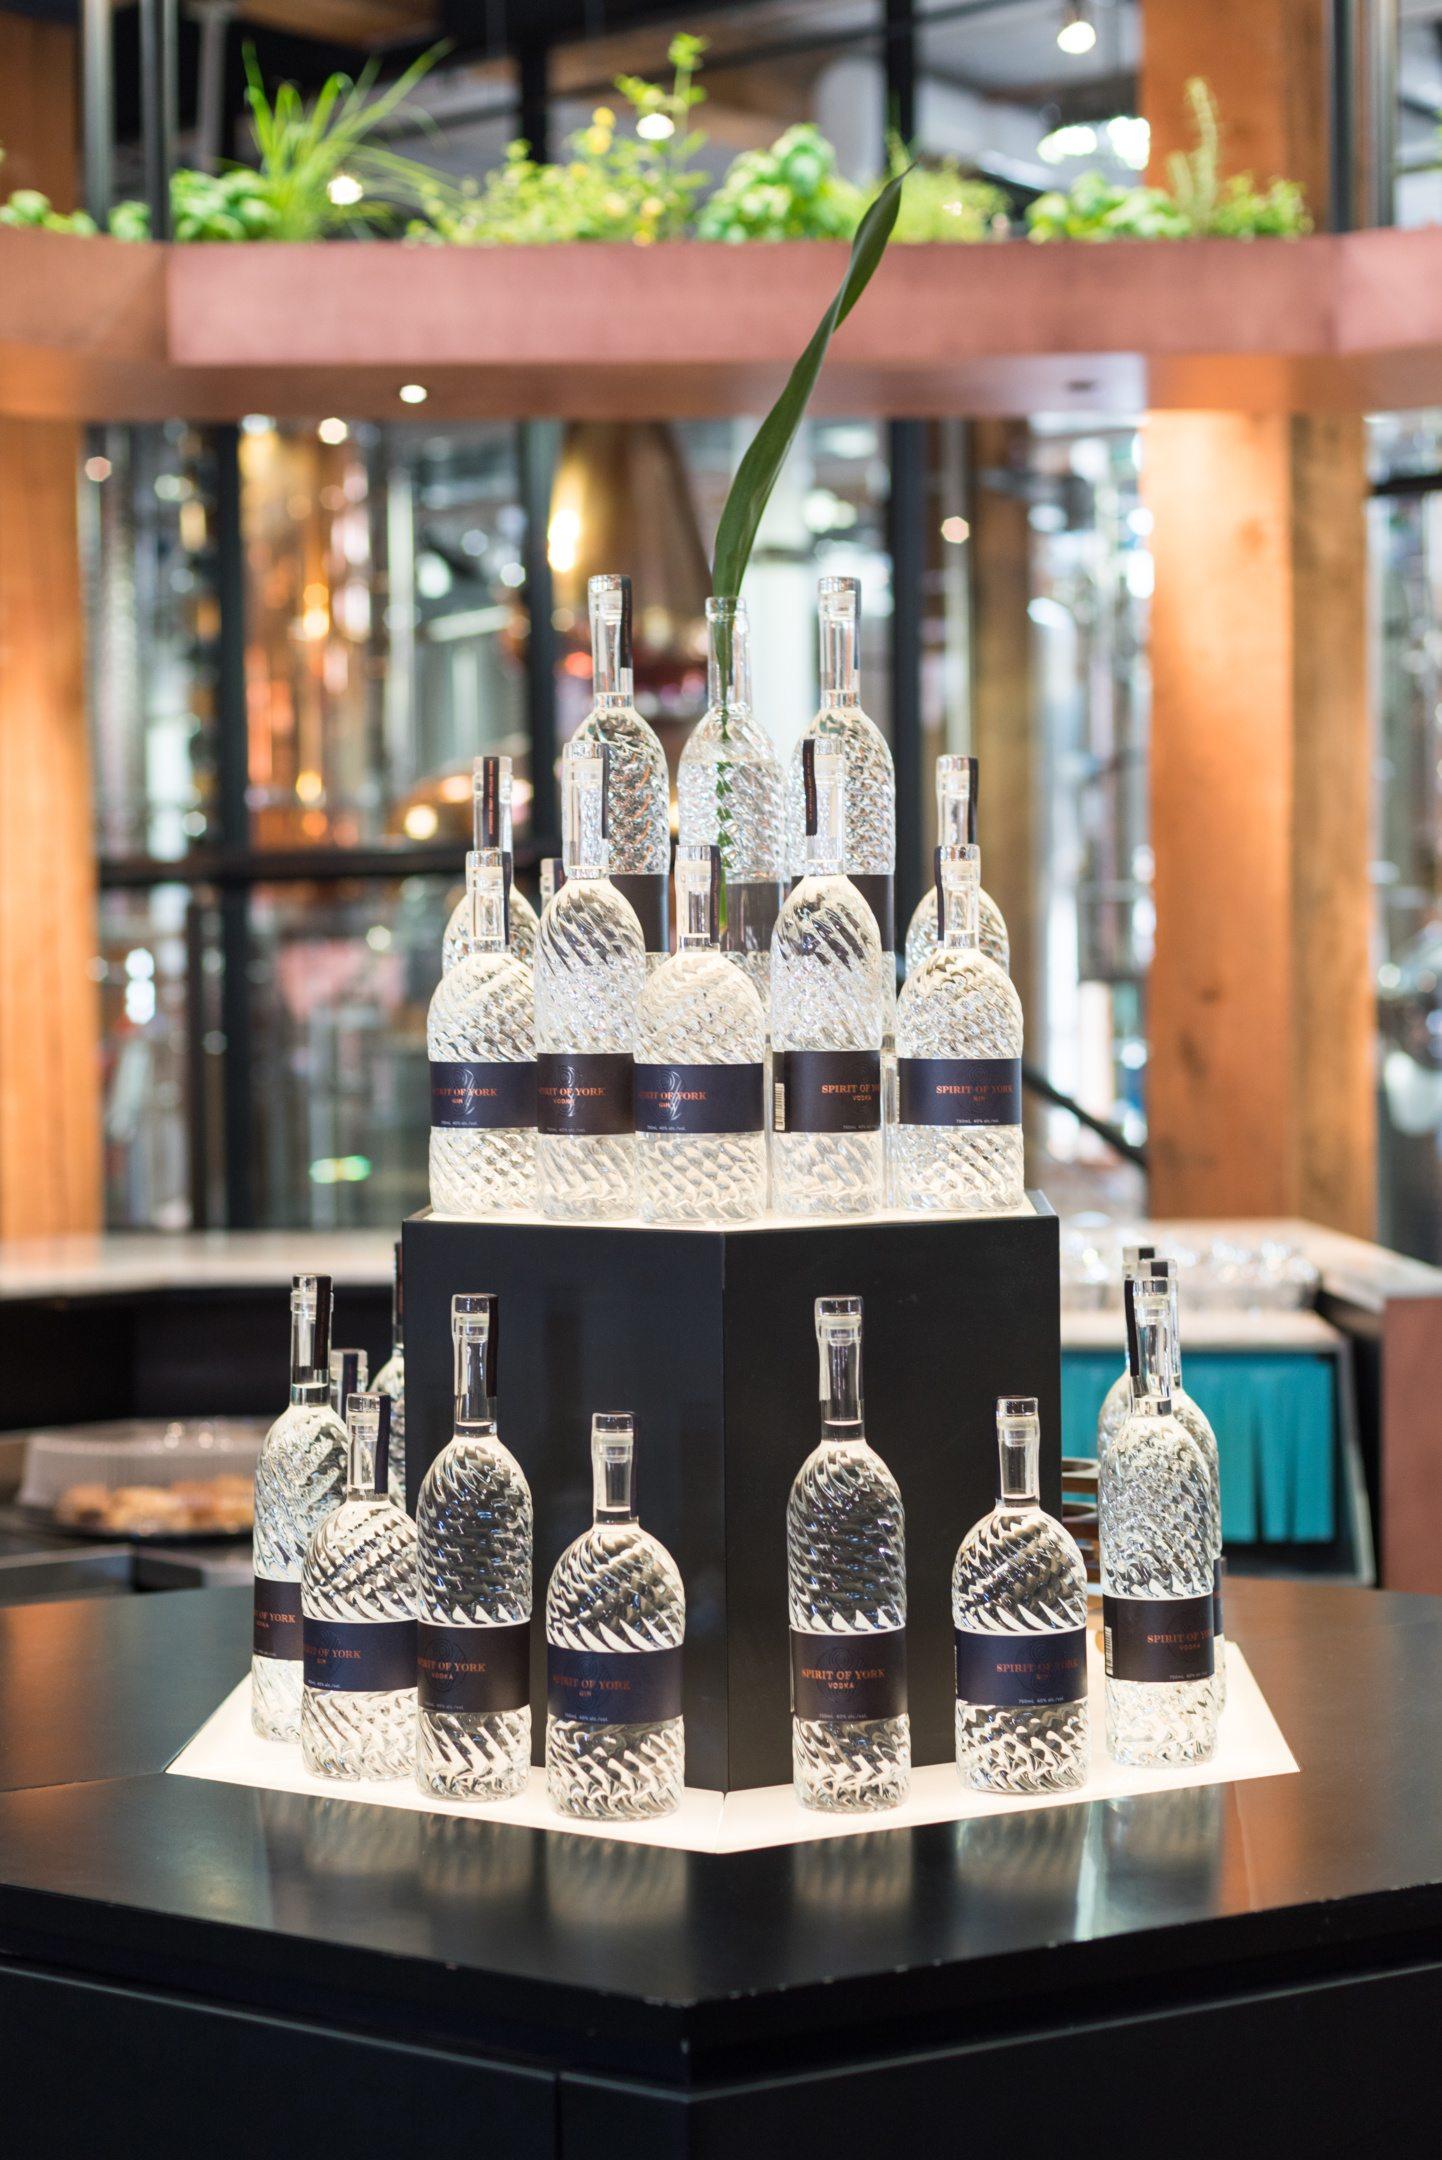 toronto-bars-spirit-of-york-distillery-co-distillery-district-vodka-gin